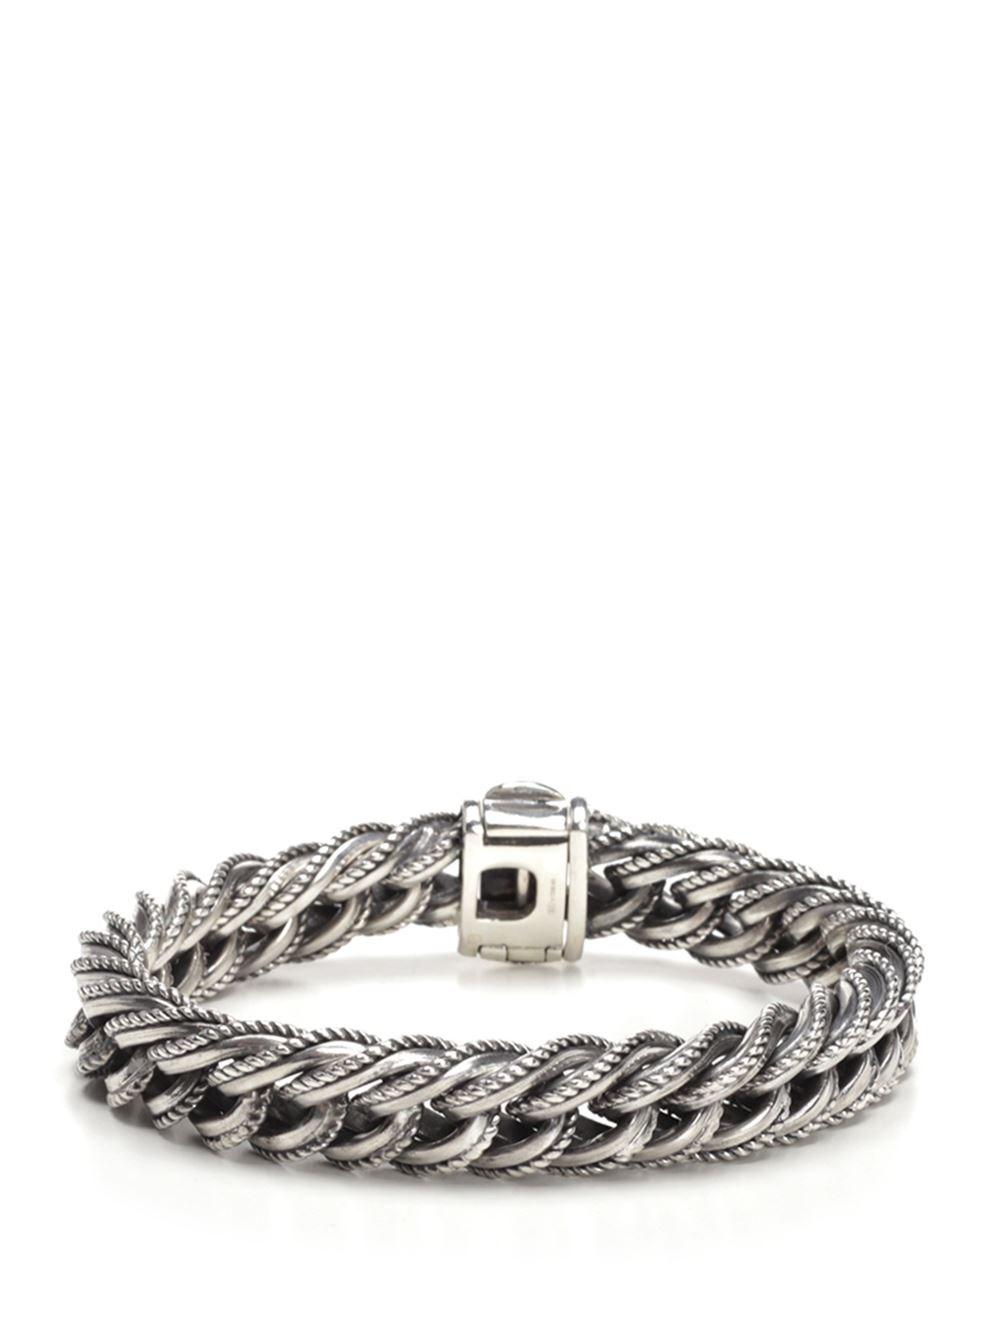 UGO CACCIATORI Silver Chain And Cable Bracelet